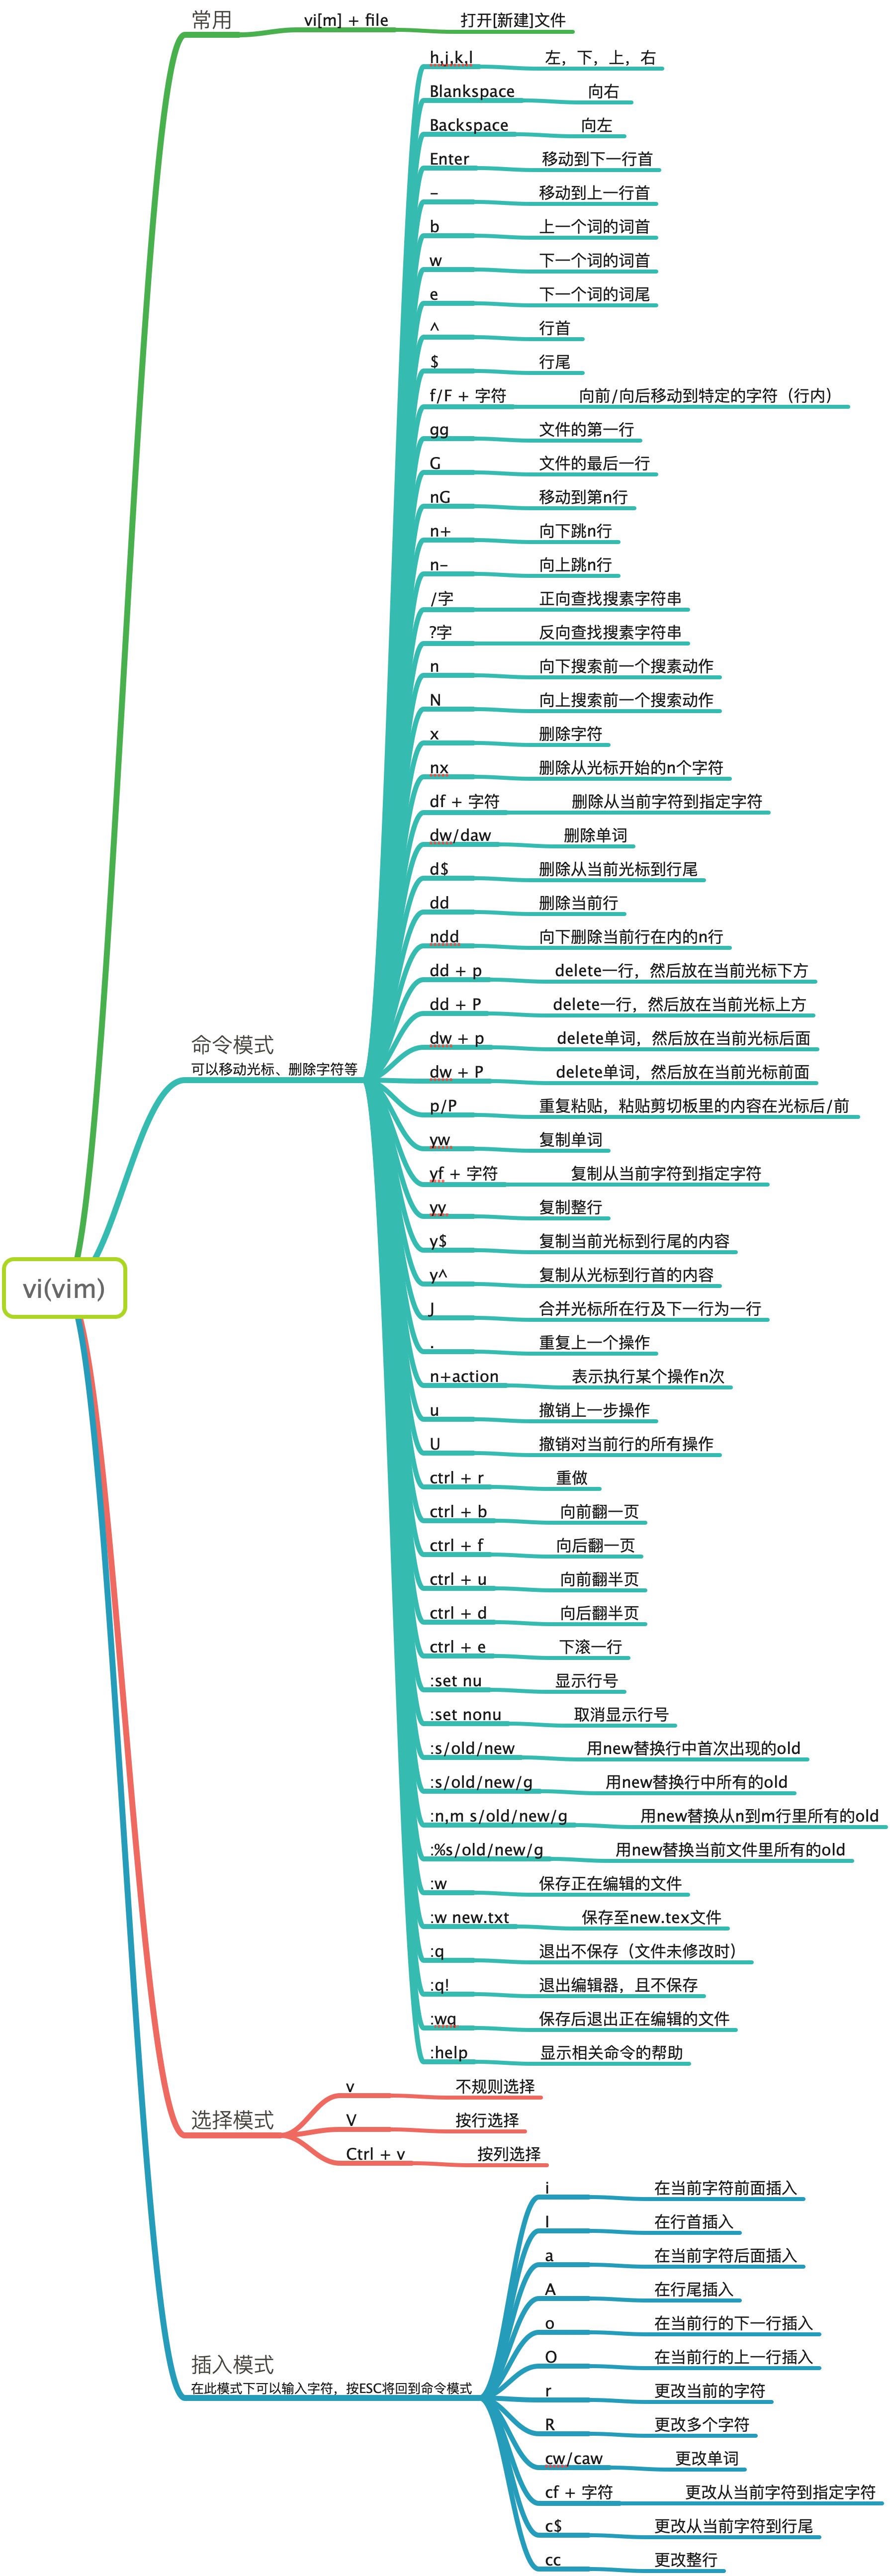 20190403-vi(vim)快捷键大全.png